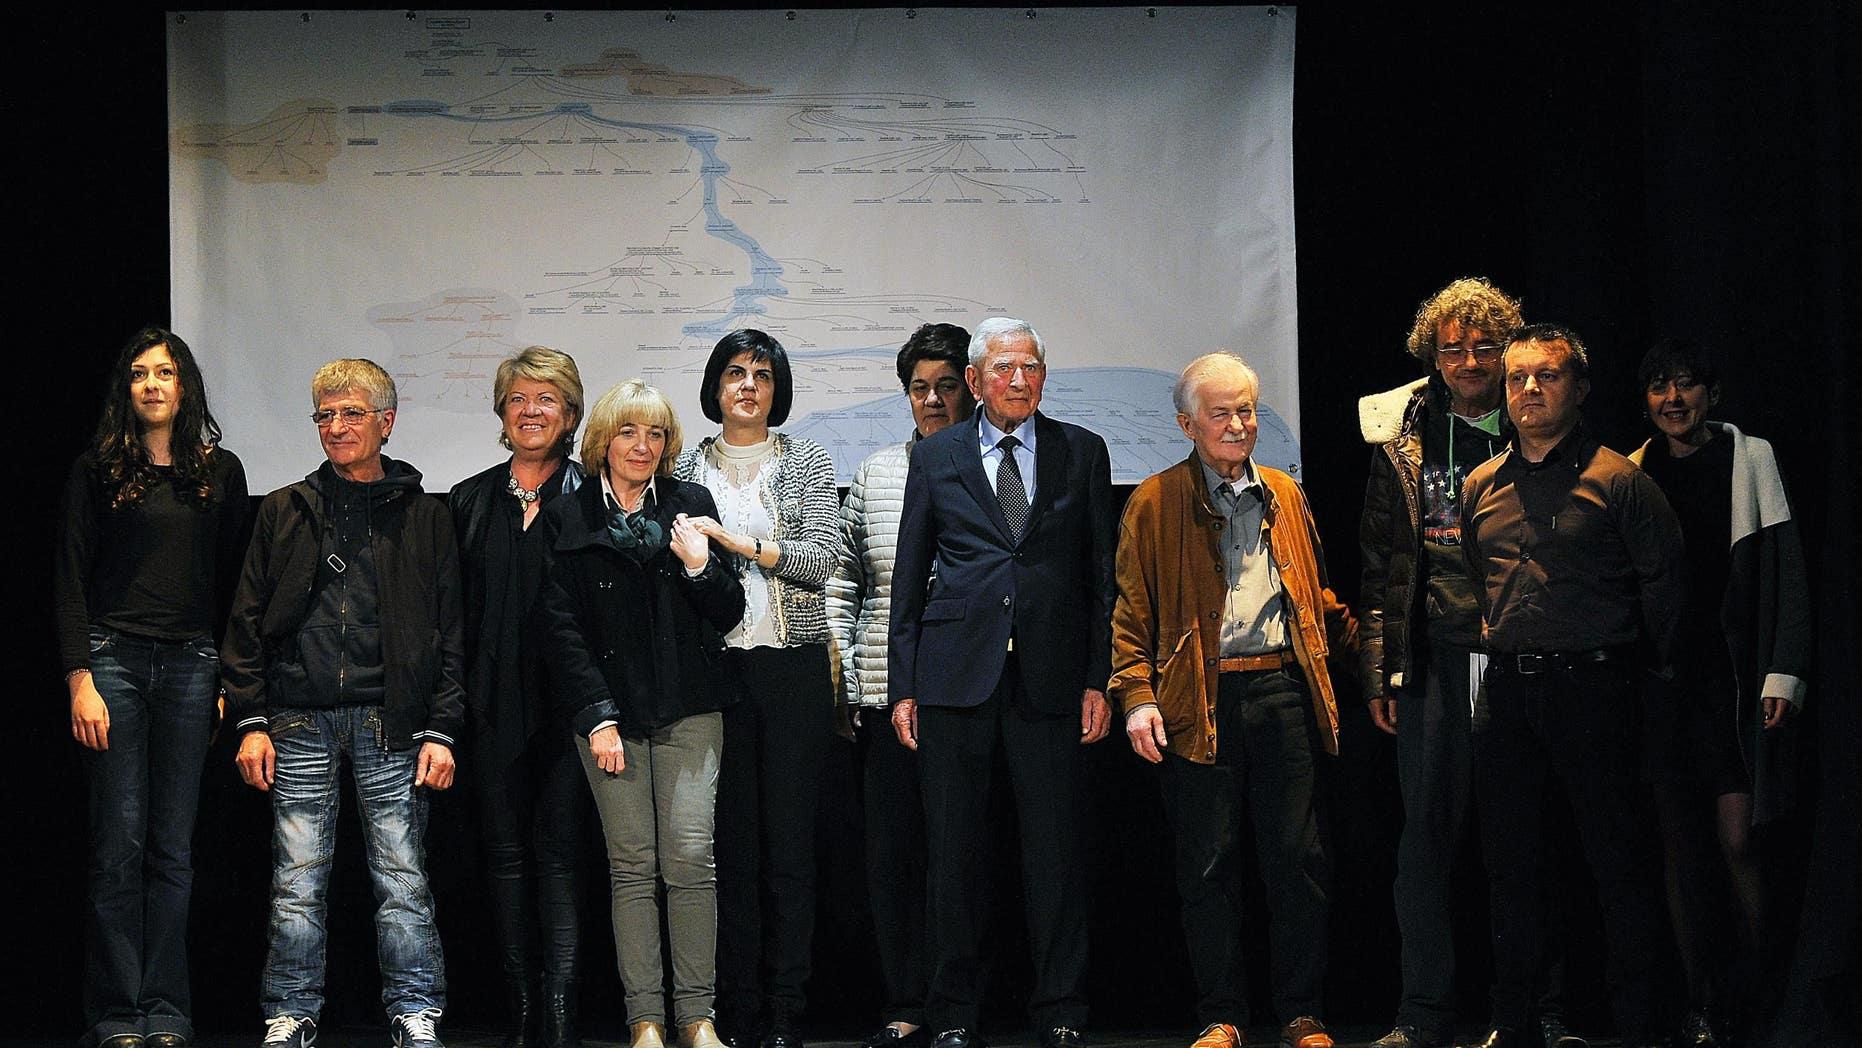 Descendants of Leonardo da Vinci pose at the theater of Vinci, near Florence, Italy, on Thursday.